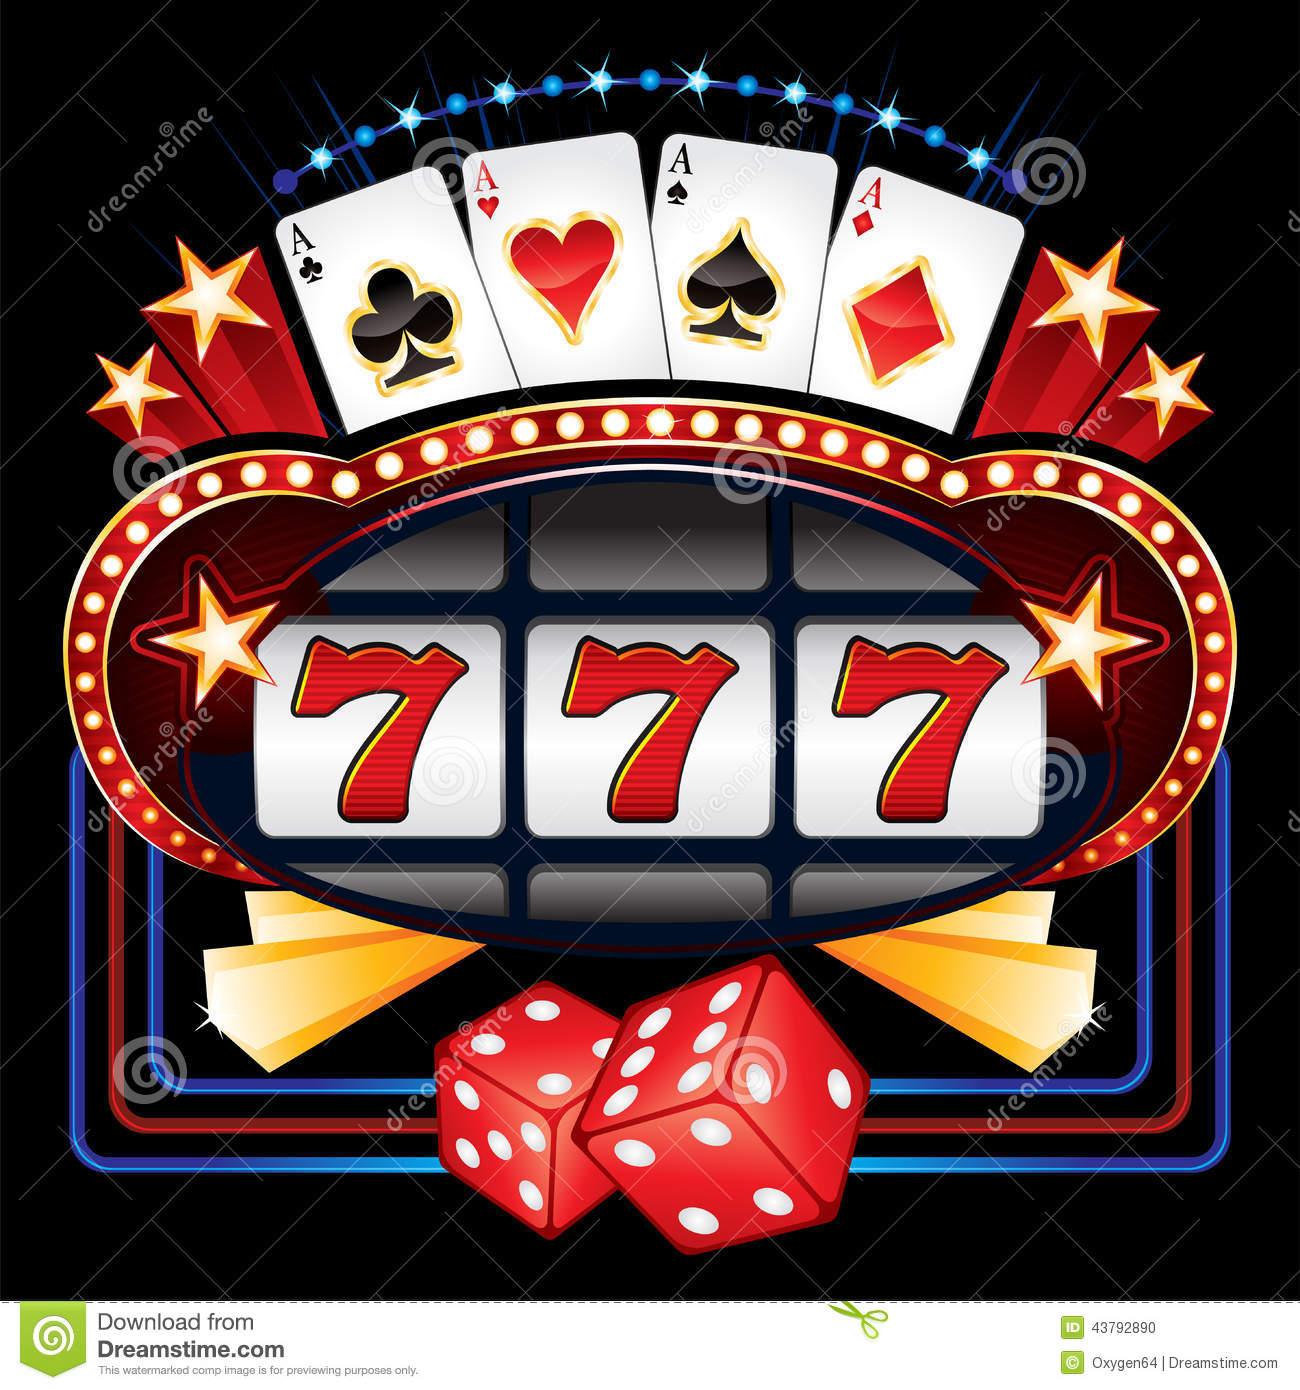 Jeux casino : mes recommandations